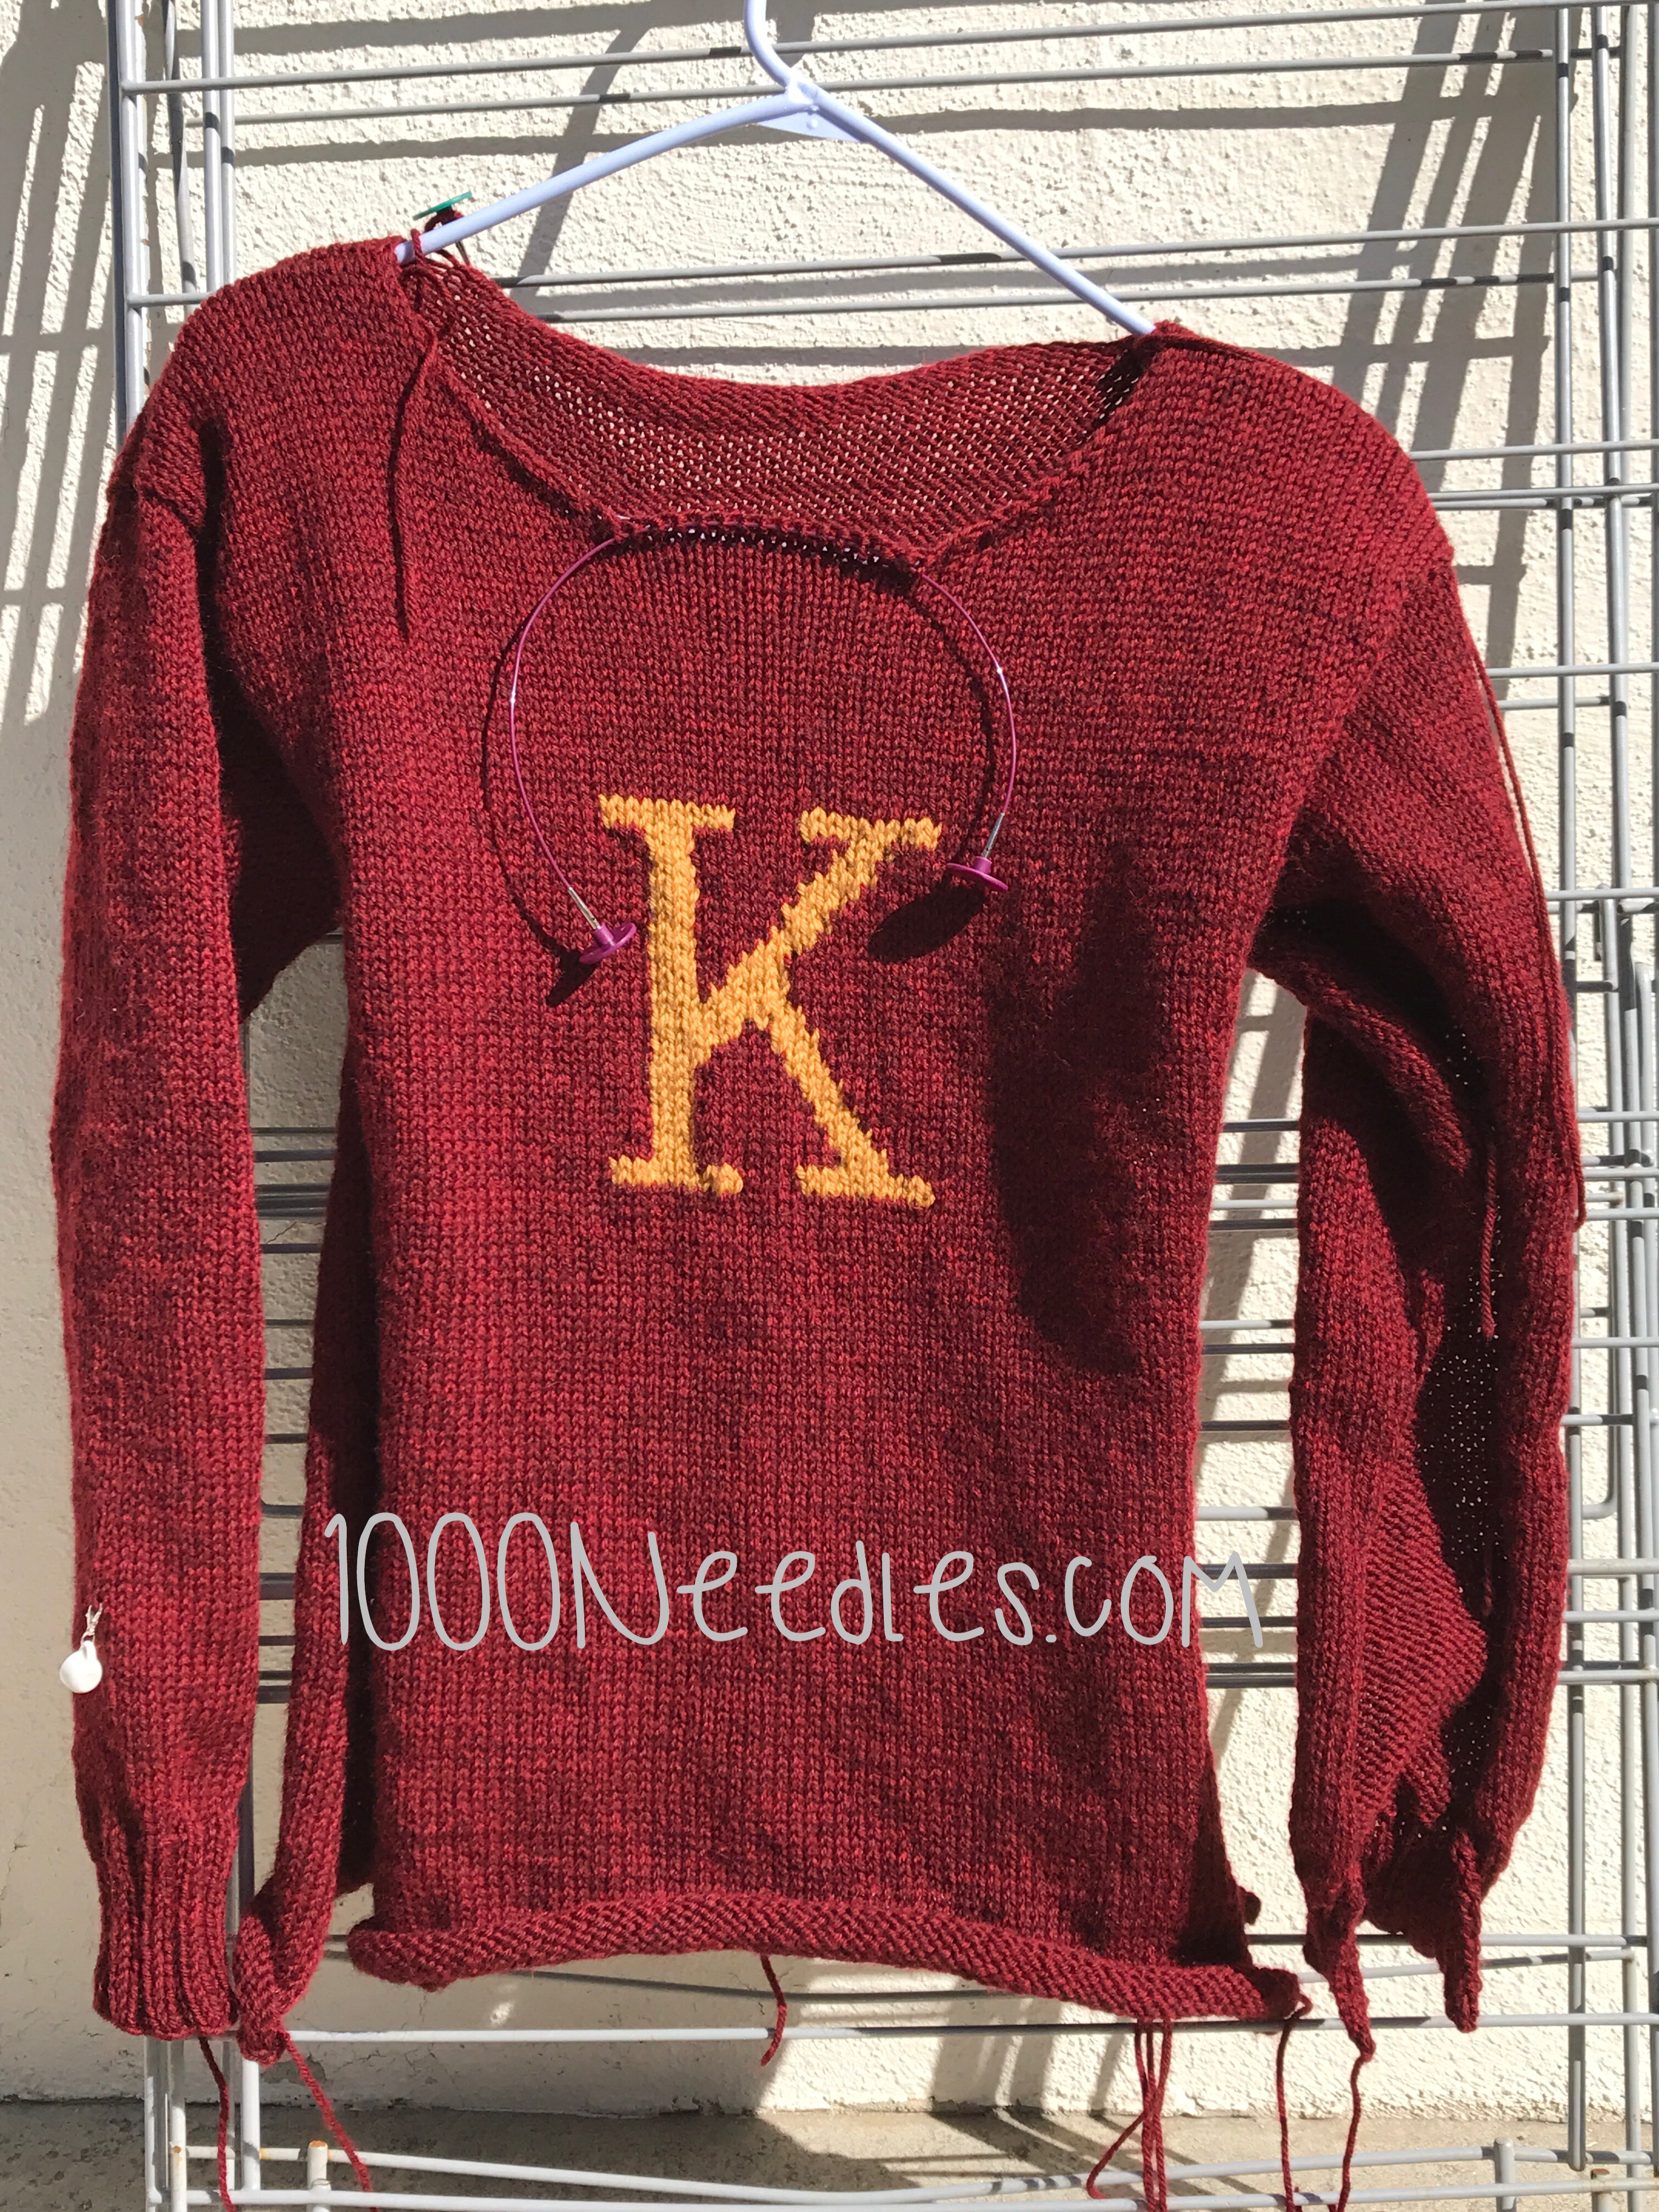 Knitting Expat Sock Club : Knitting update week thousand needles